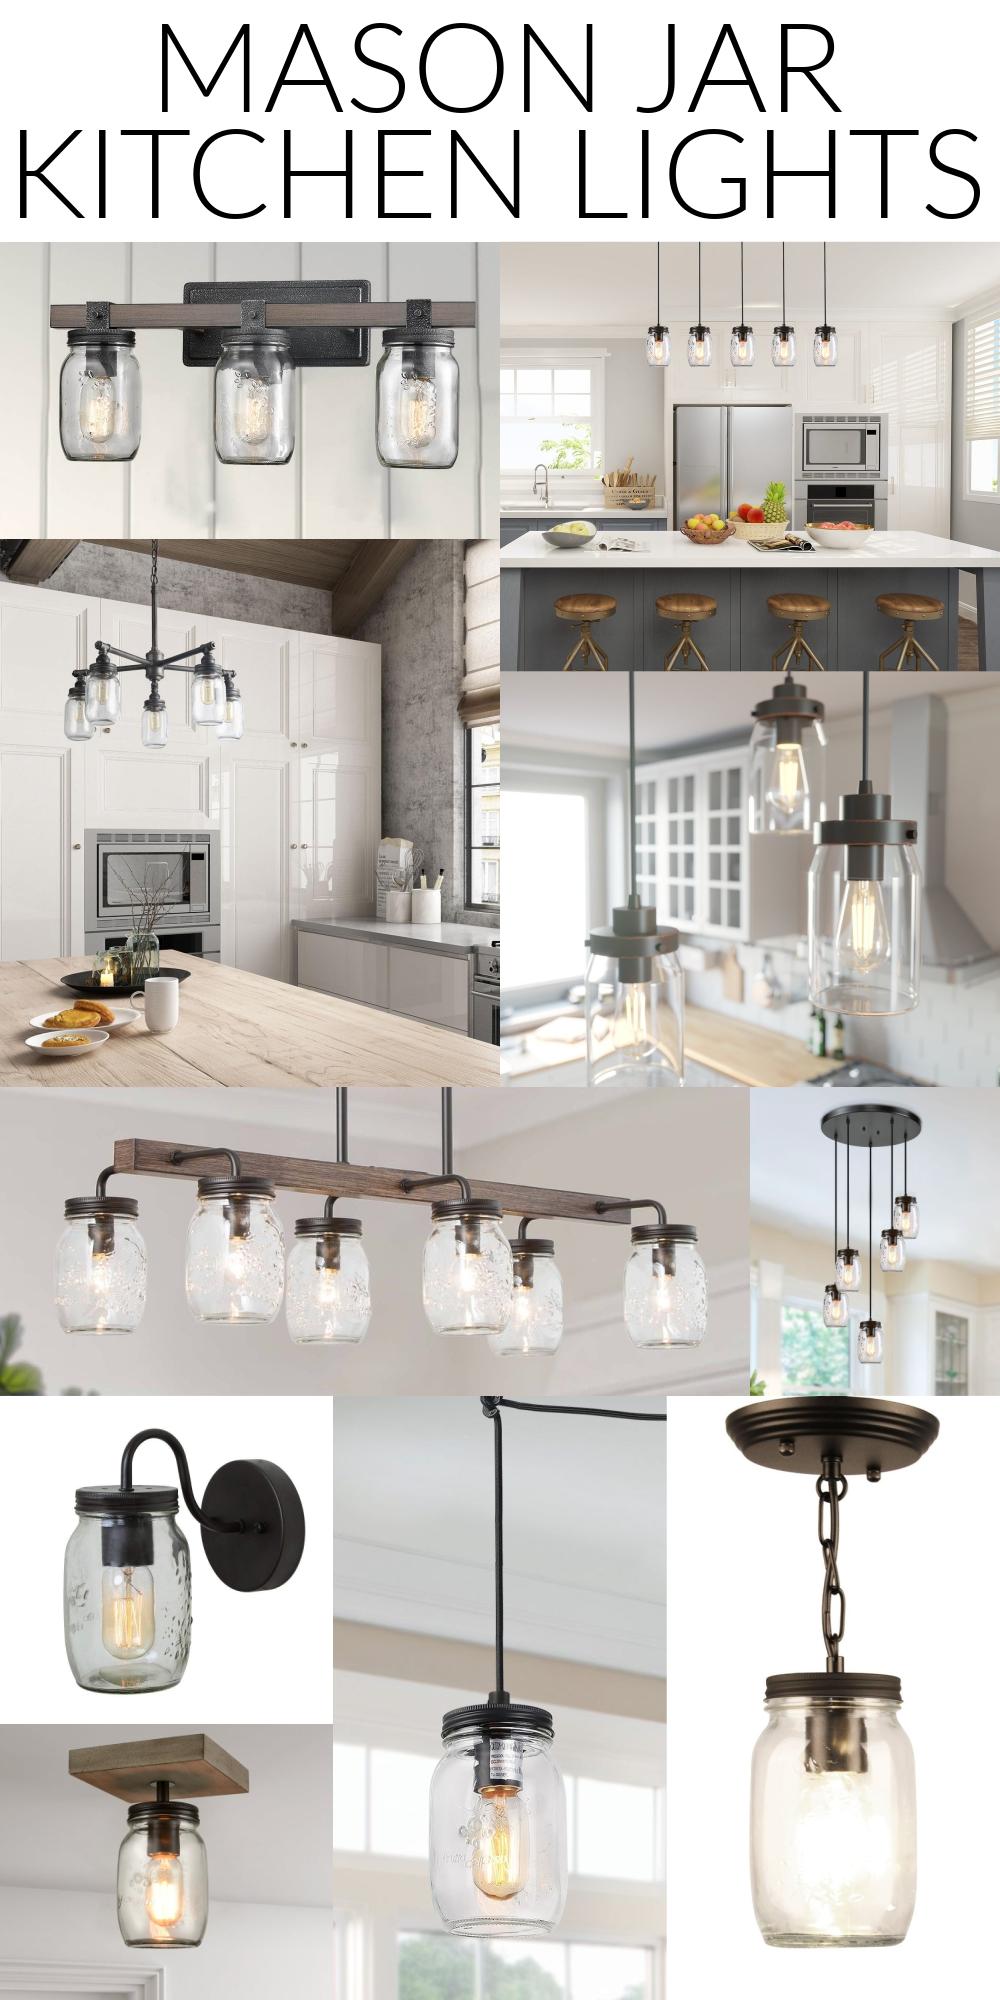 mason jar kitchen lights